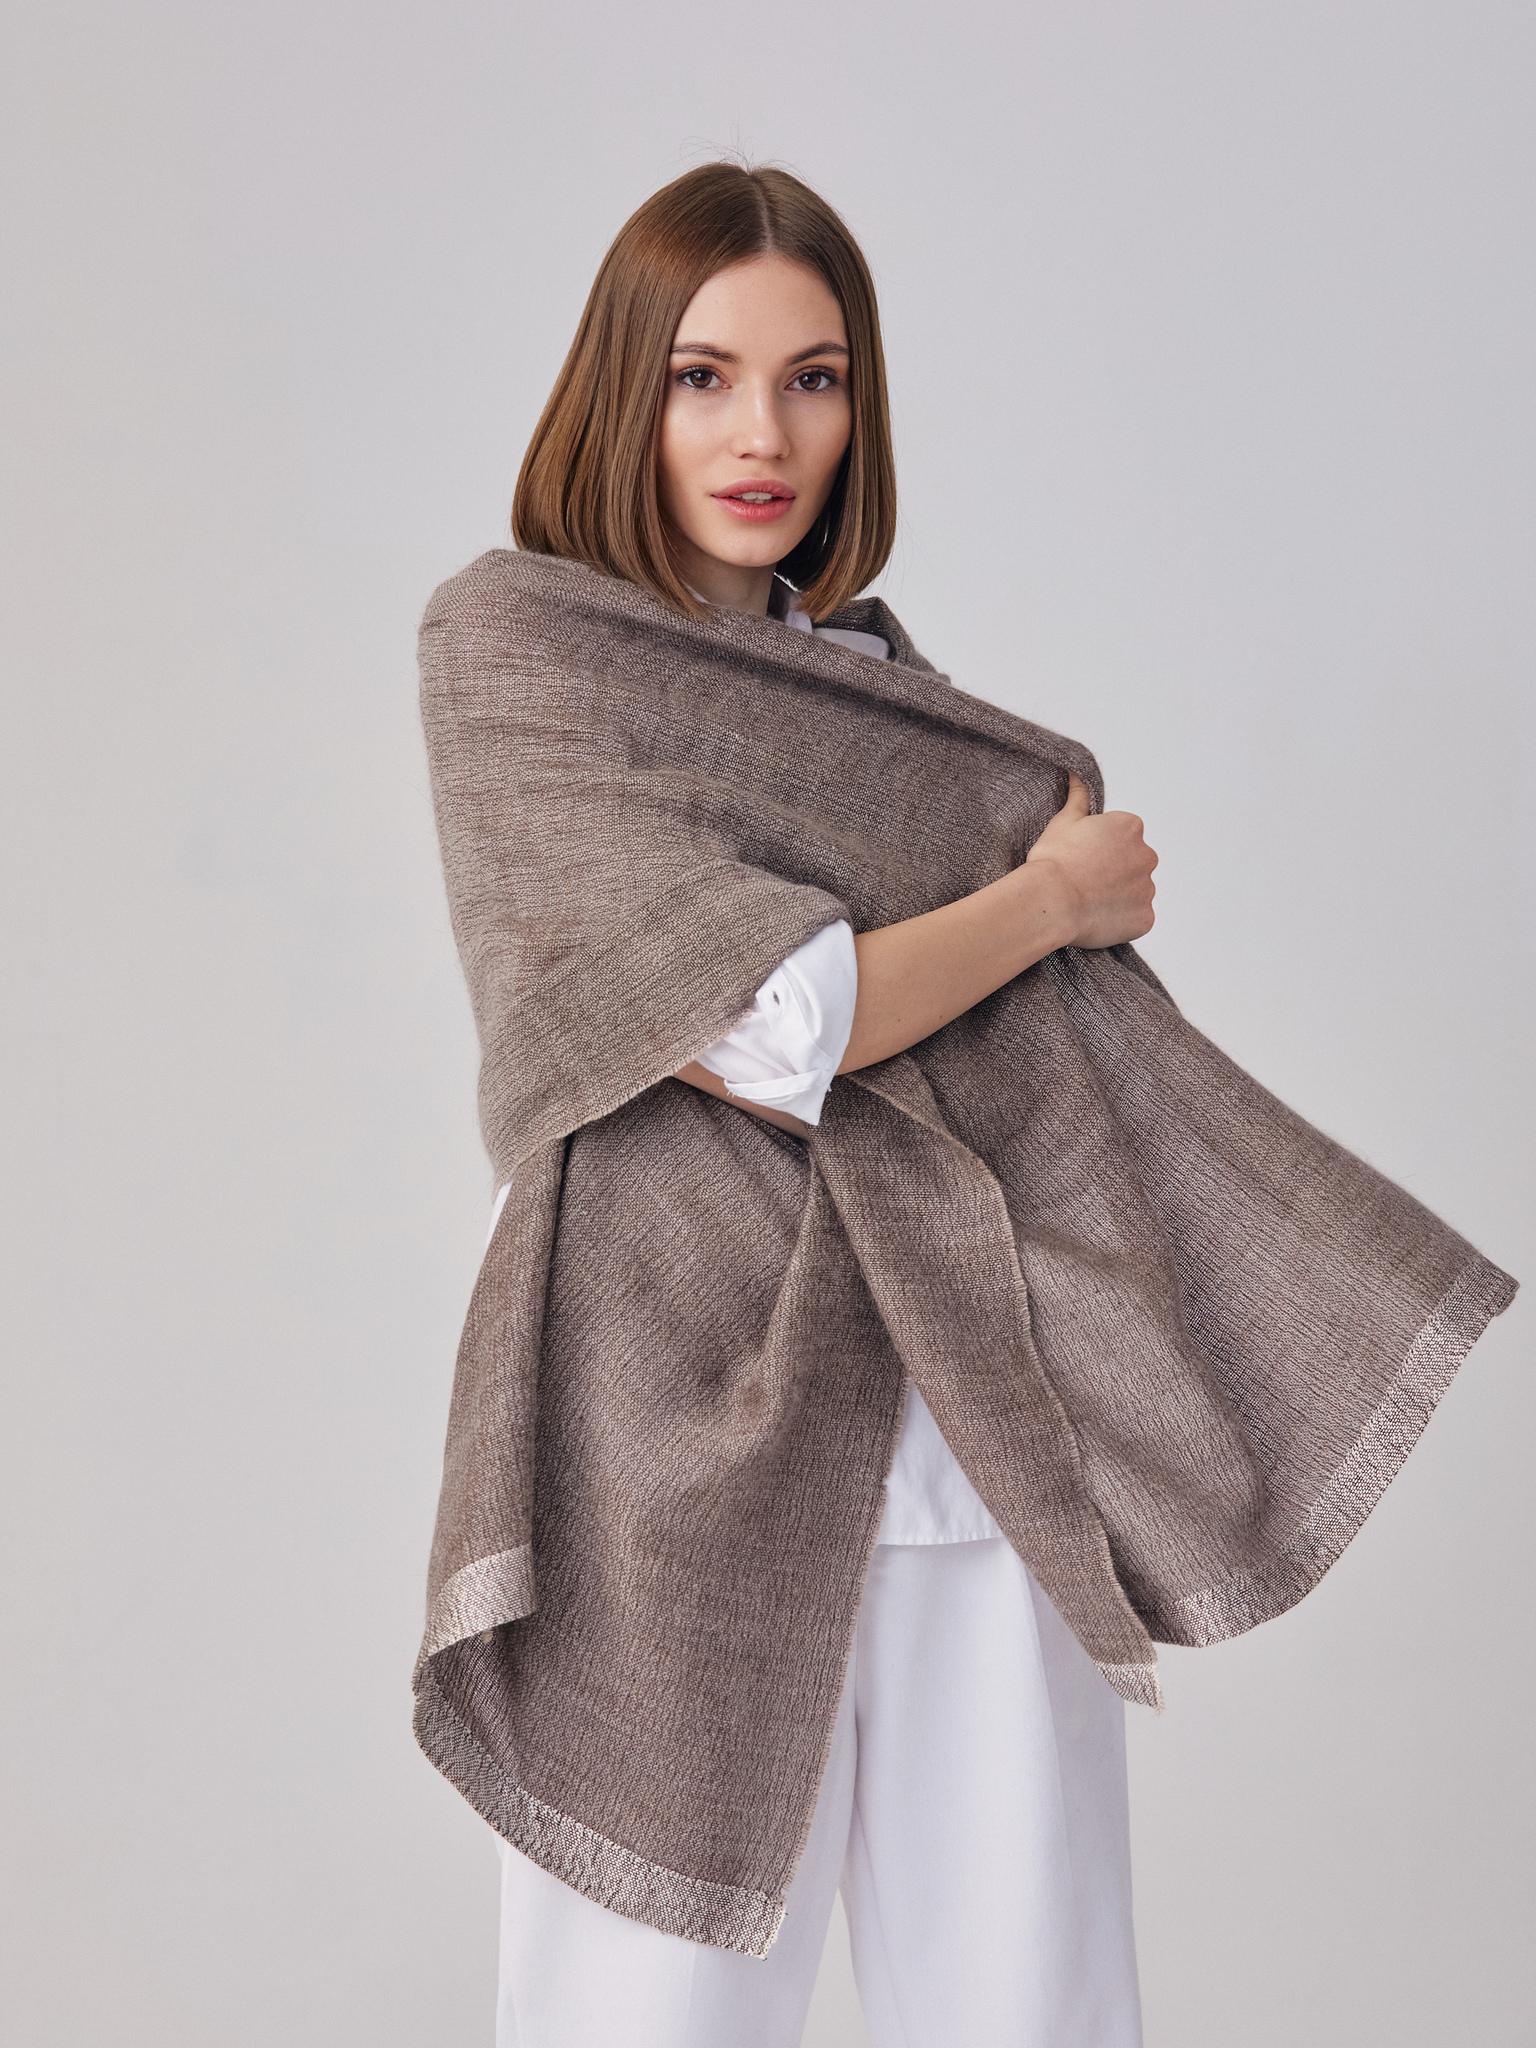 Тканый палантин из ангоры, кашемира и шелка коричневый шарф шаль